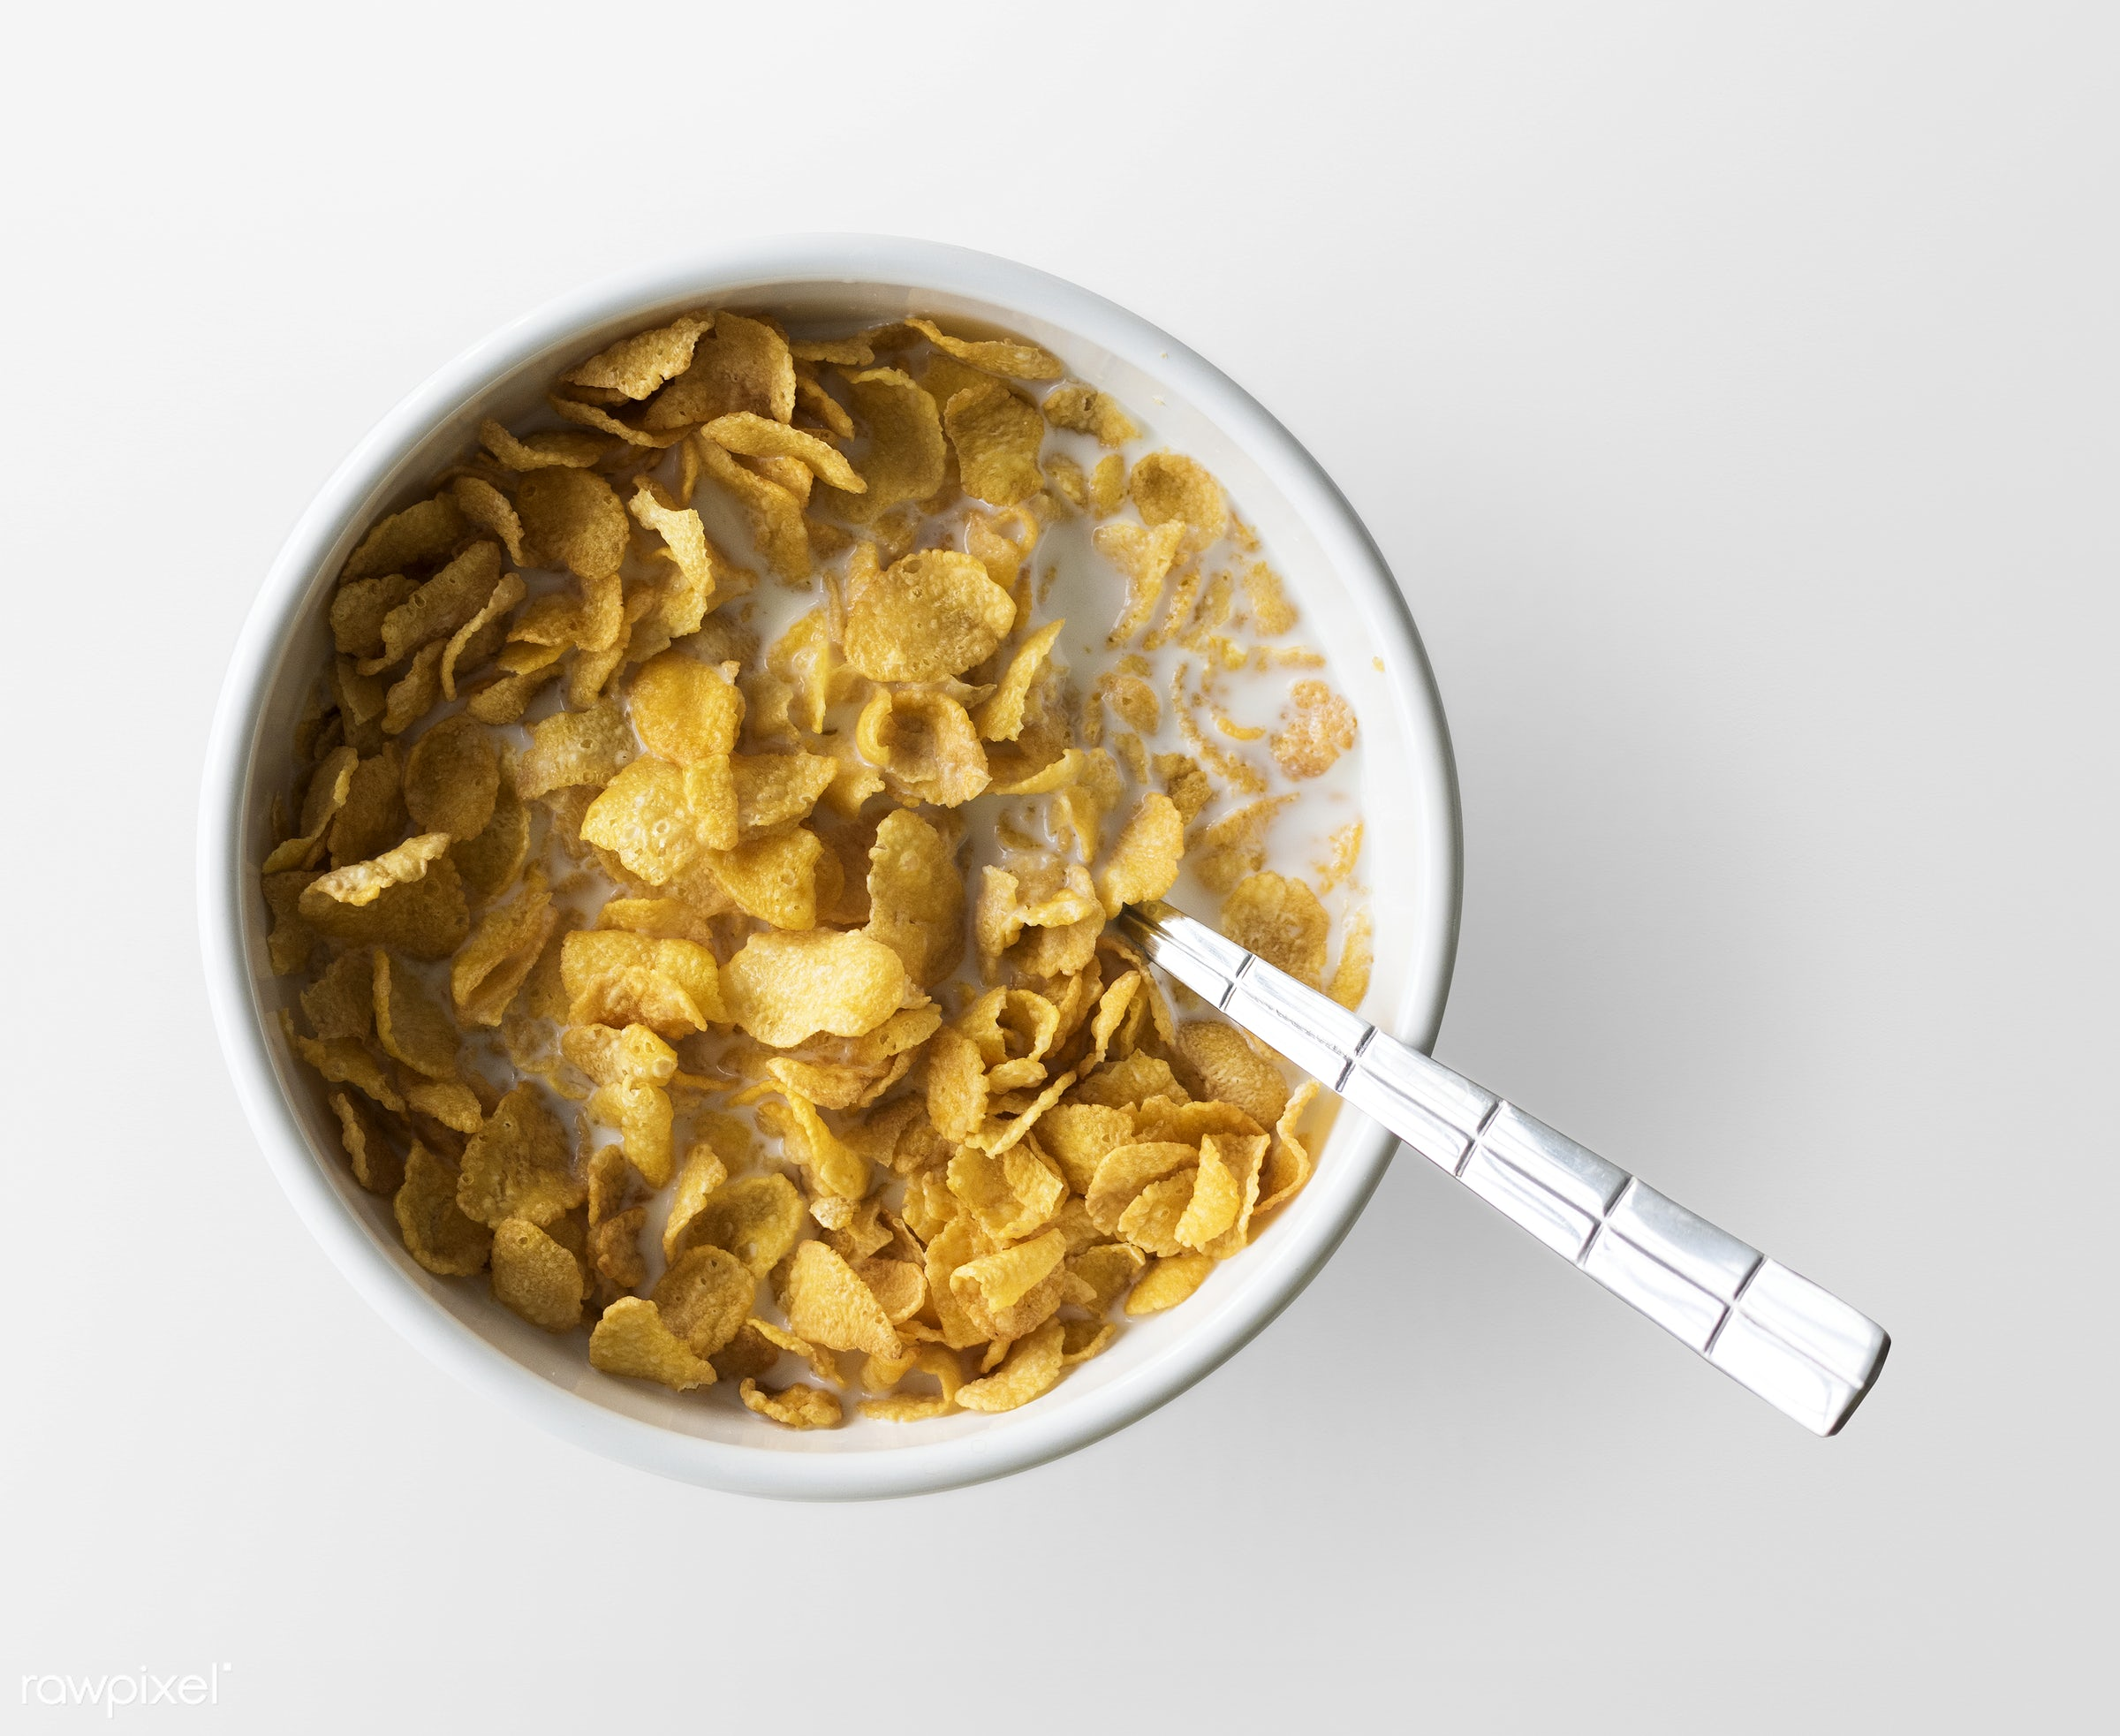 breakfast, cereal, milk, aerial view, background, bowl, cornflake, crisp, crunchy, delicious, diet, energy, food, healthy,...